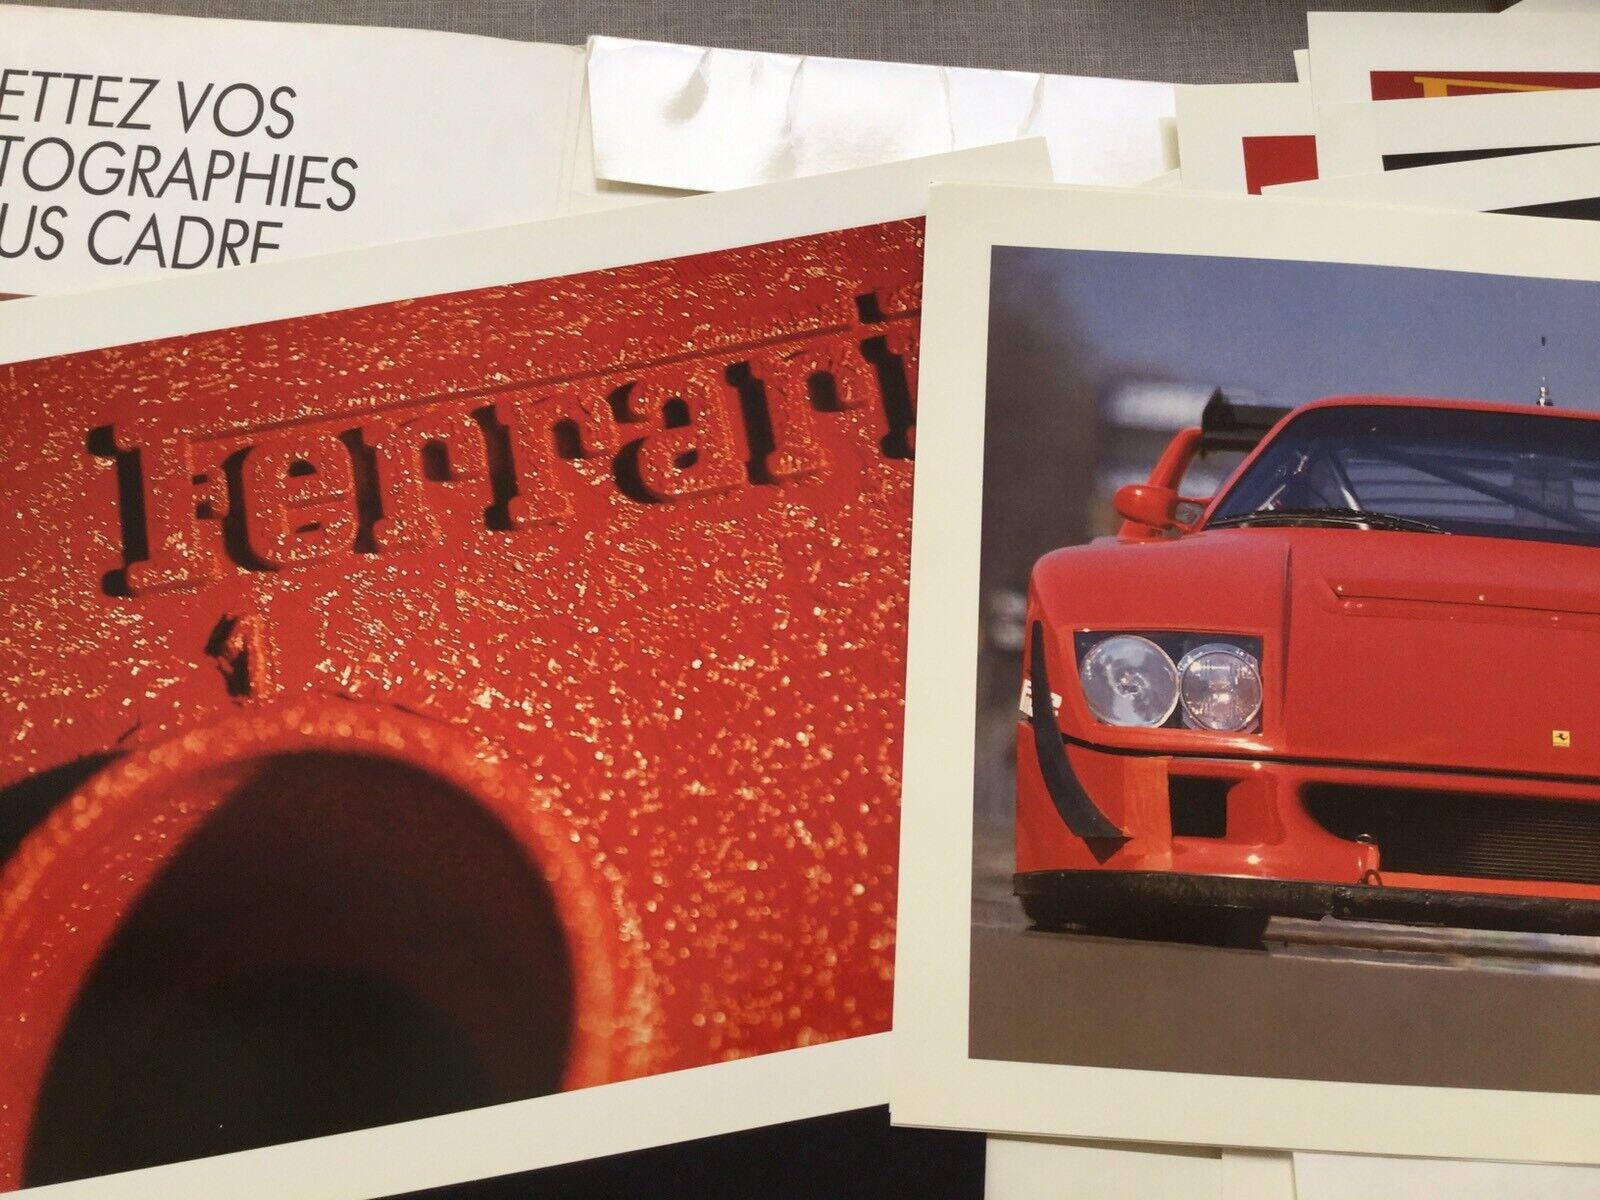 Venta en línea de descuento de fábrica Ferrari F40 16 photo's posters by Albérique Haas a3 mint mint mint  protección post-venta